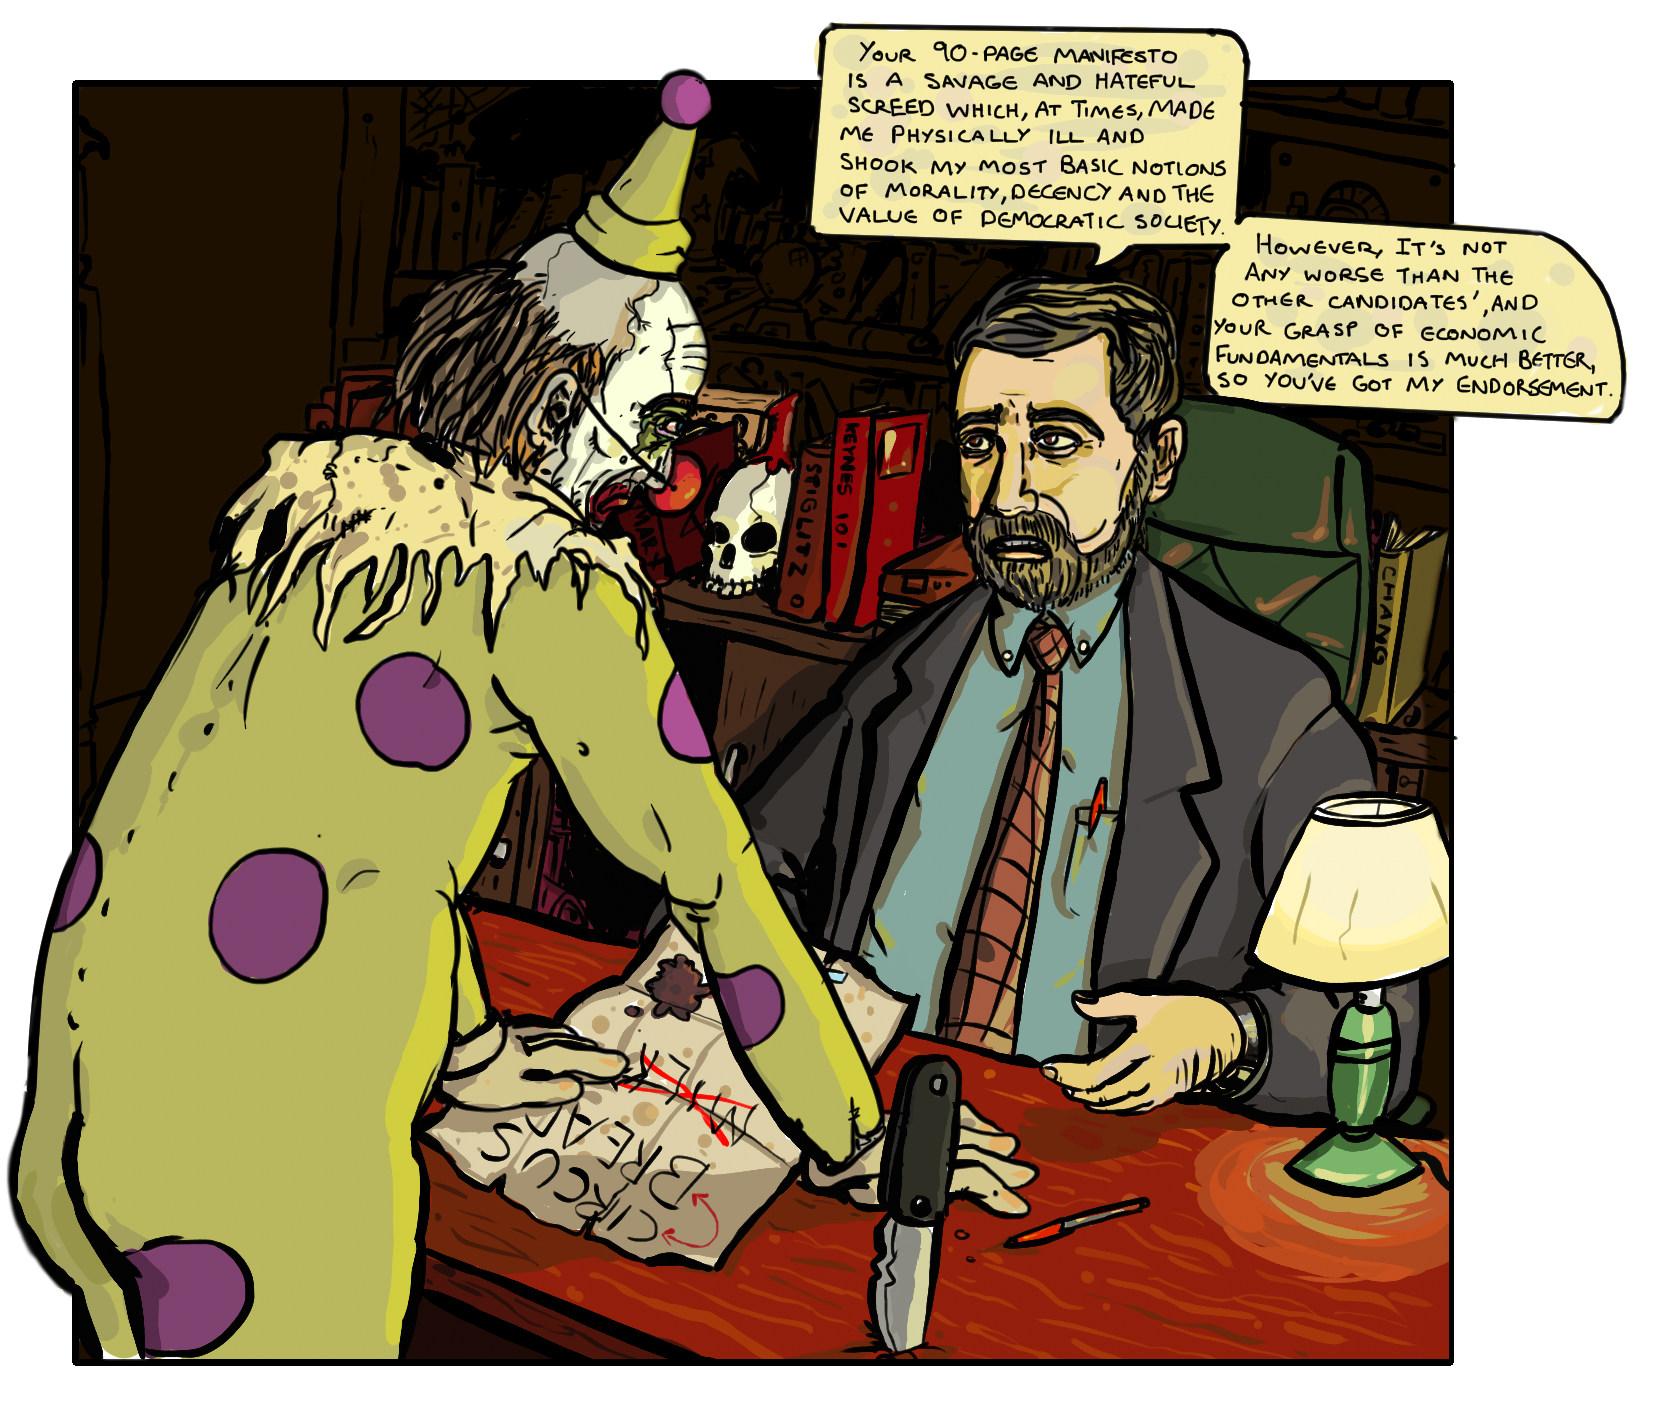 Clown and Krugman